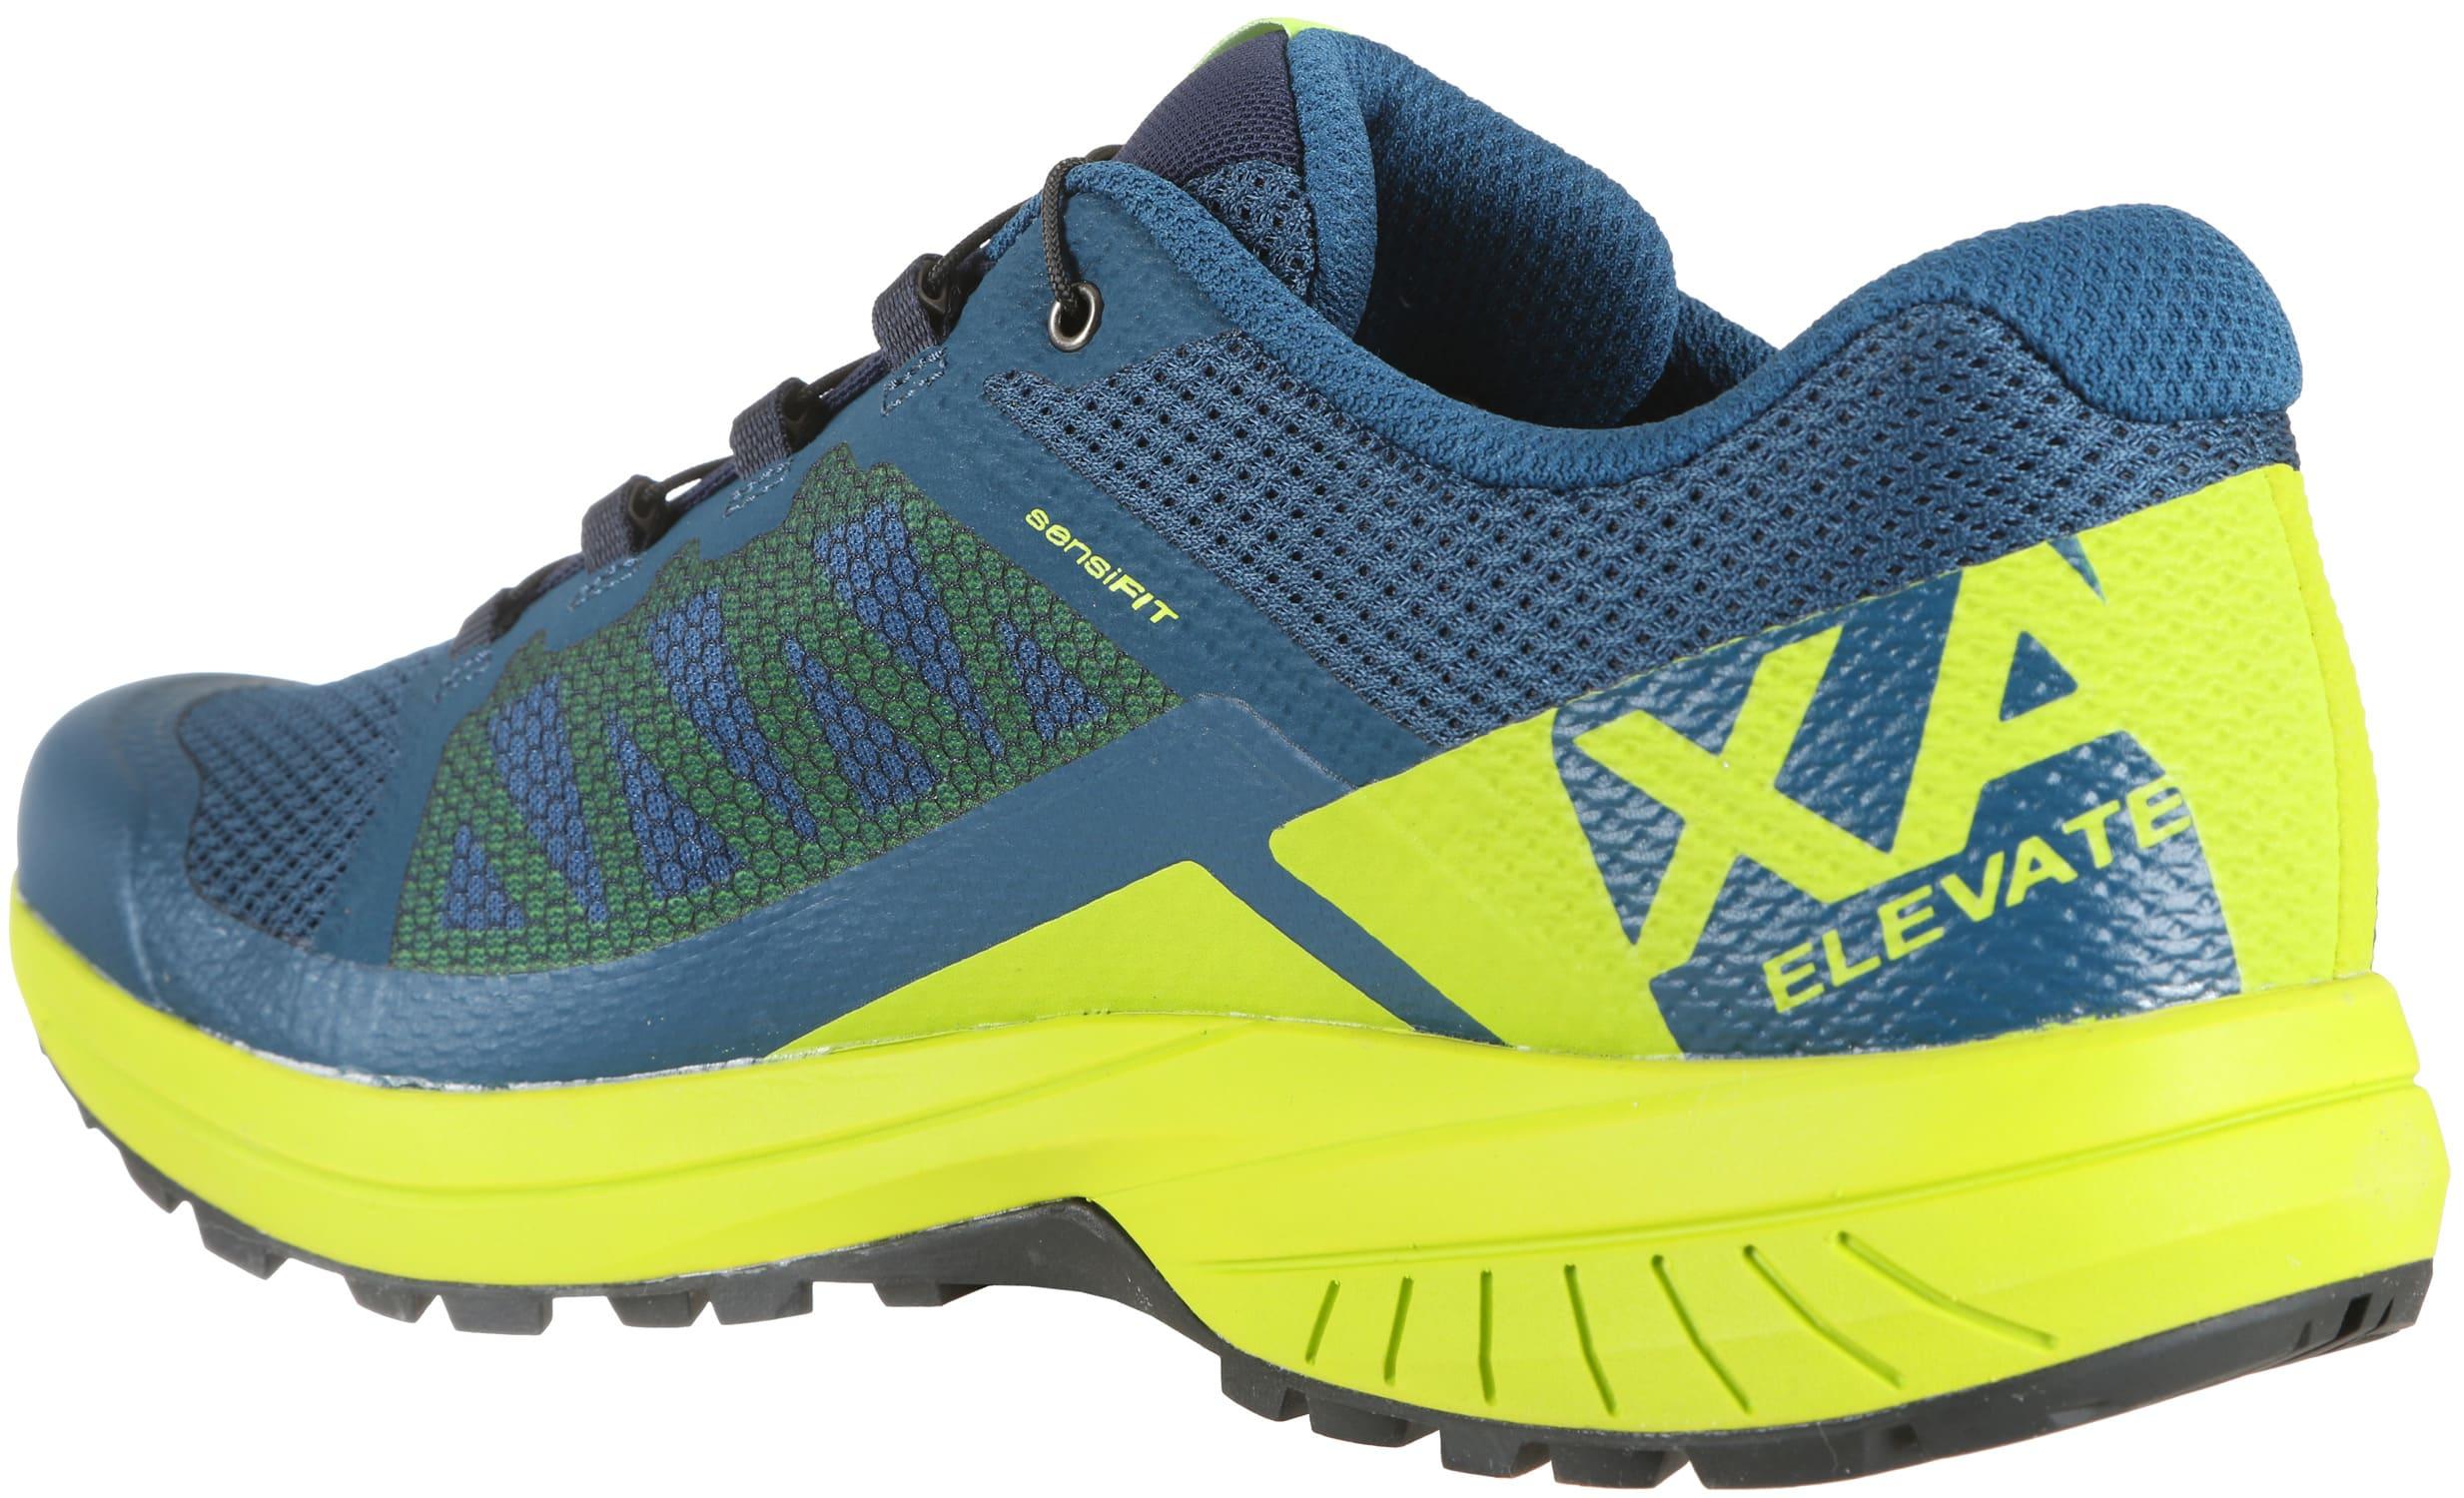 2d41b1498e45 Salomon XA Elevate Trail Running Shoes - thumbnail 3